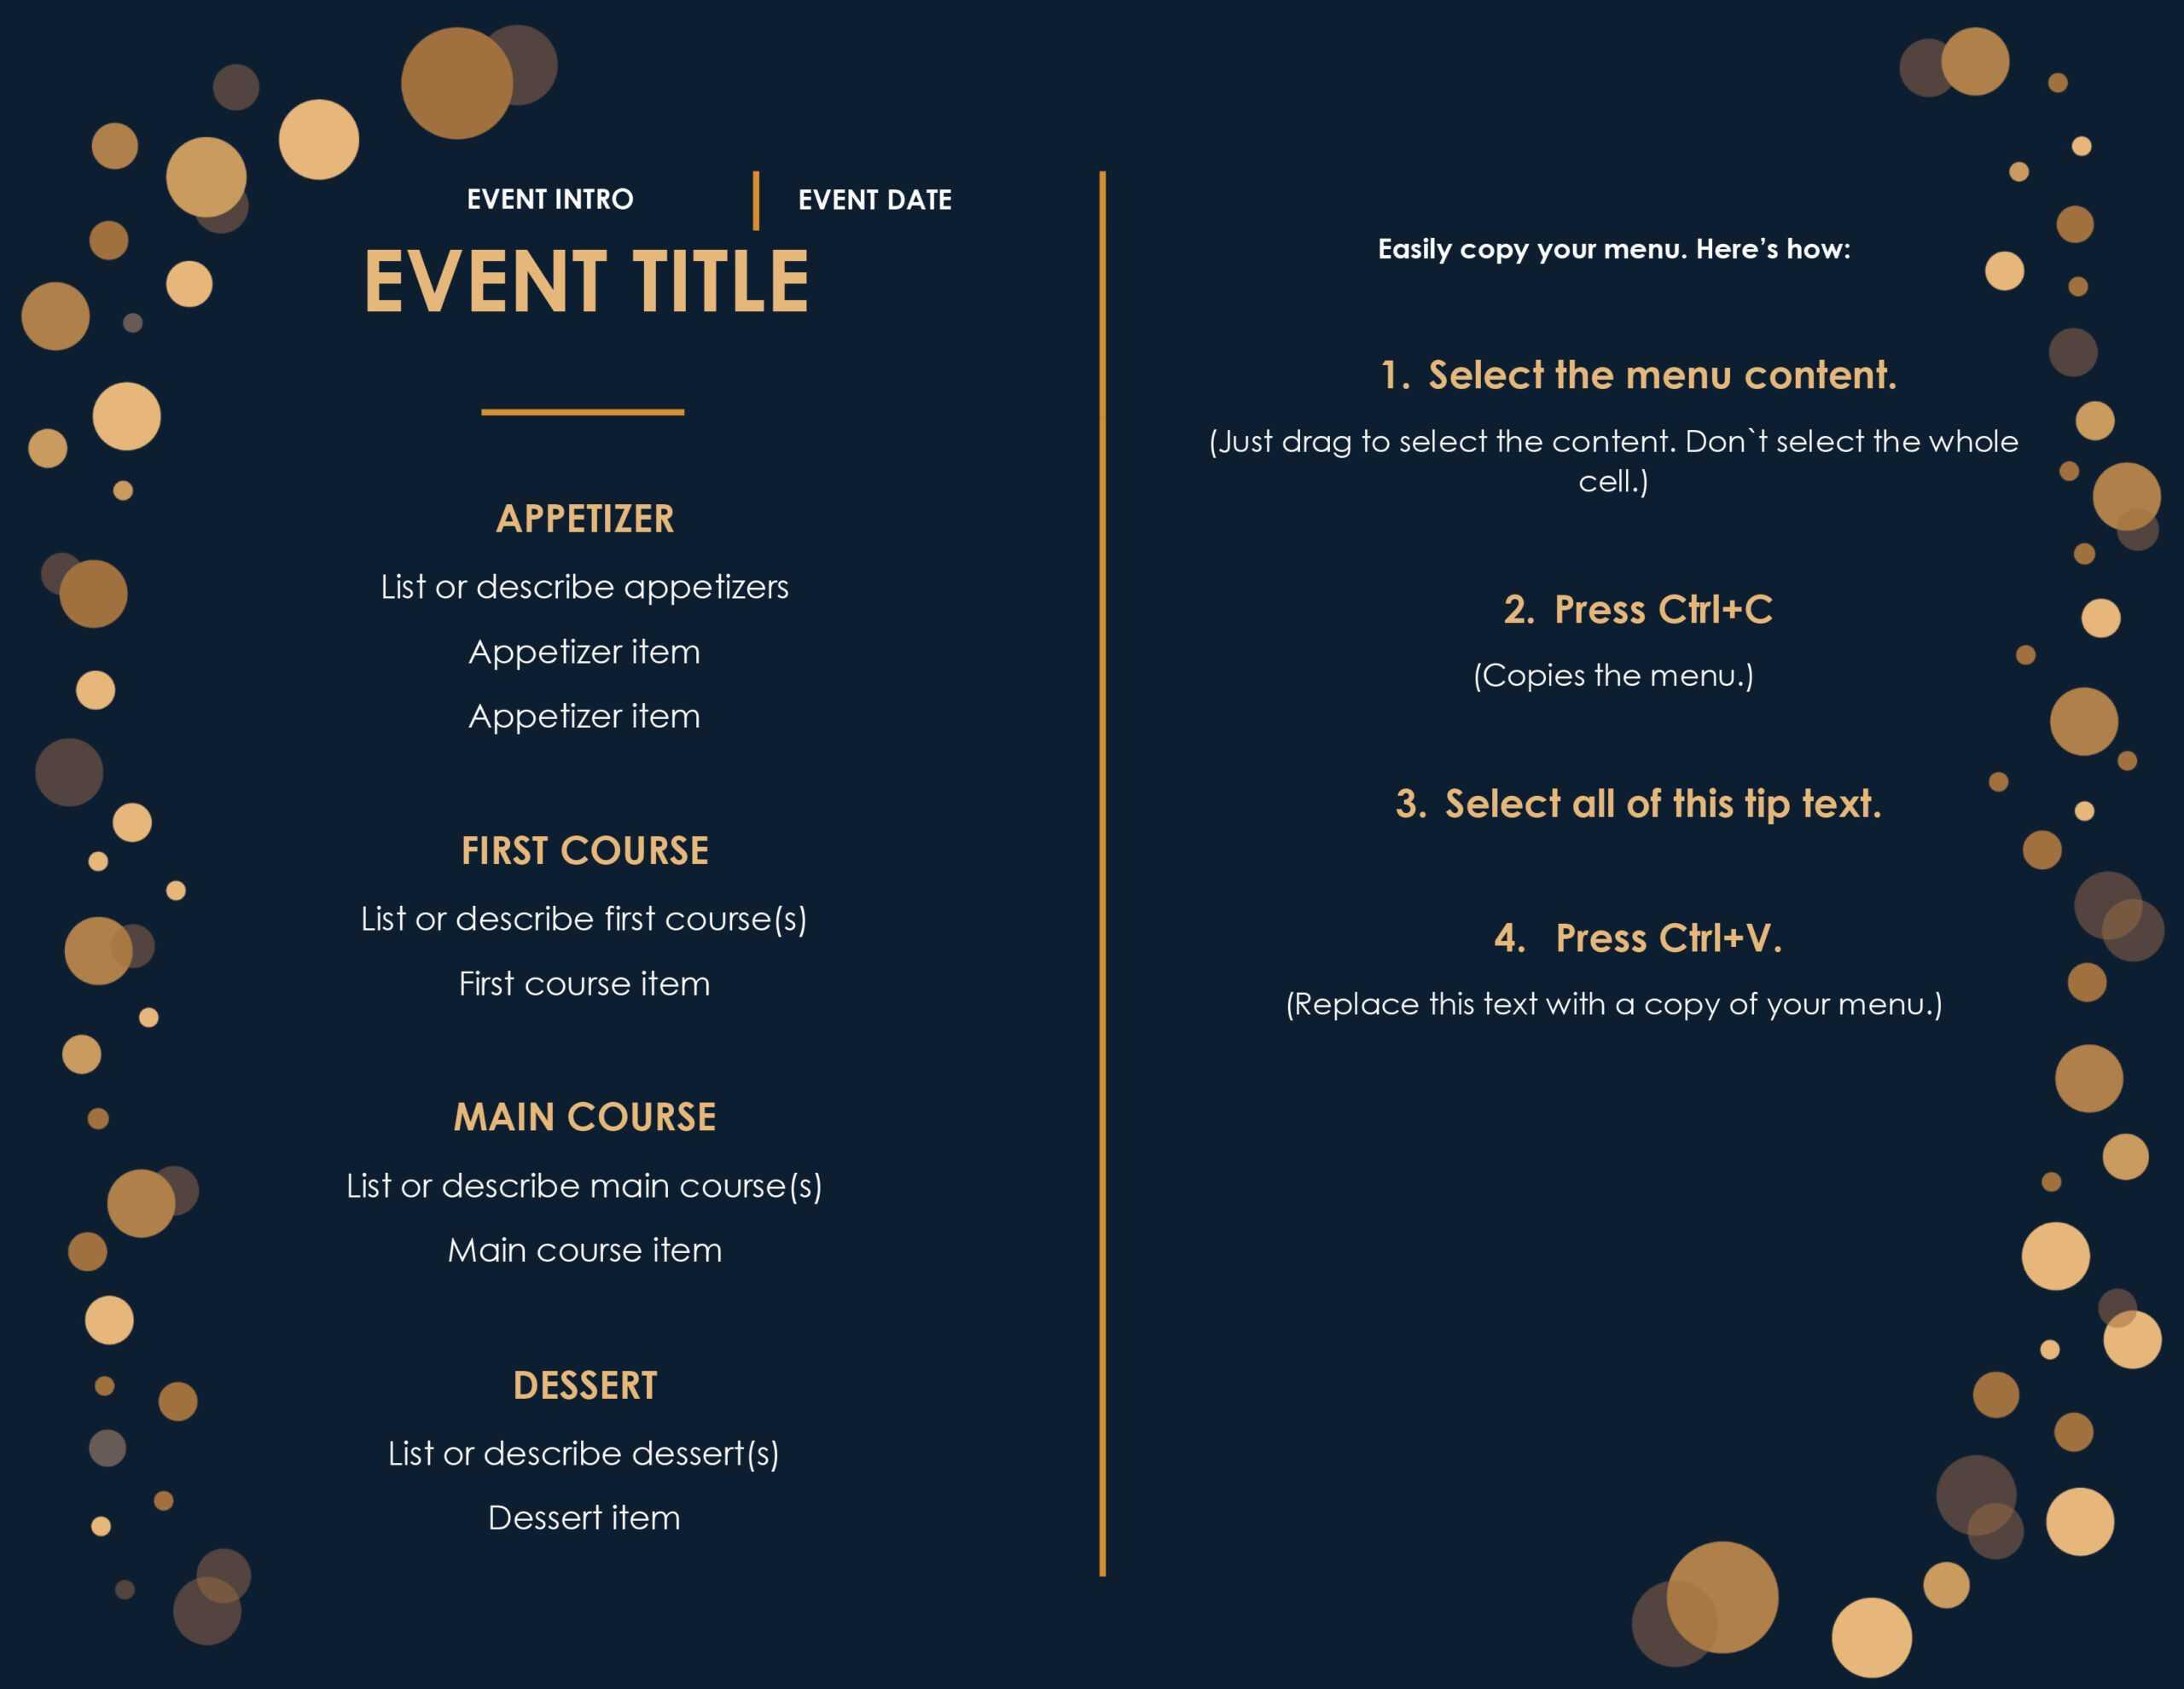 32 Free Simple Menu Templates For Restaurants, Cafes, And With Regard To Free Cafe Menu Templates For Word